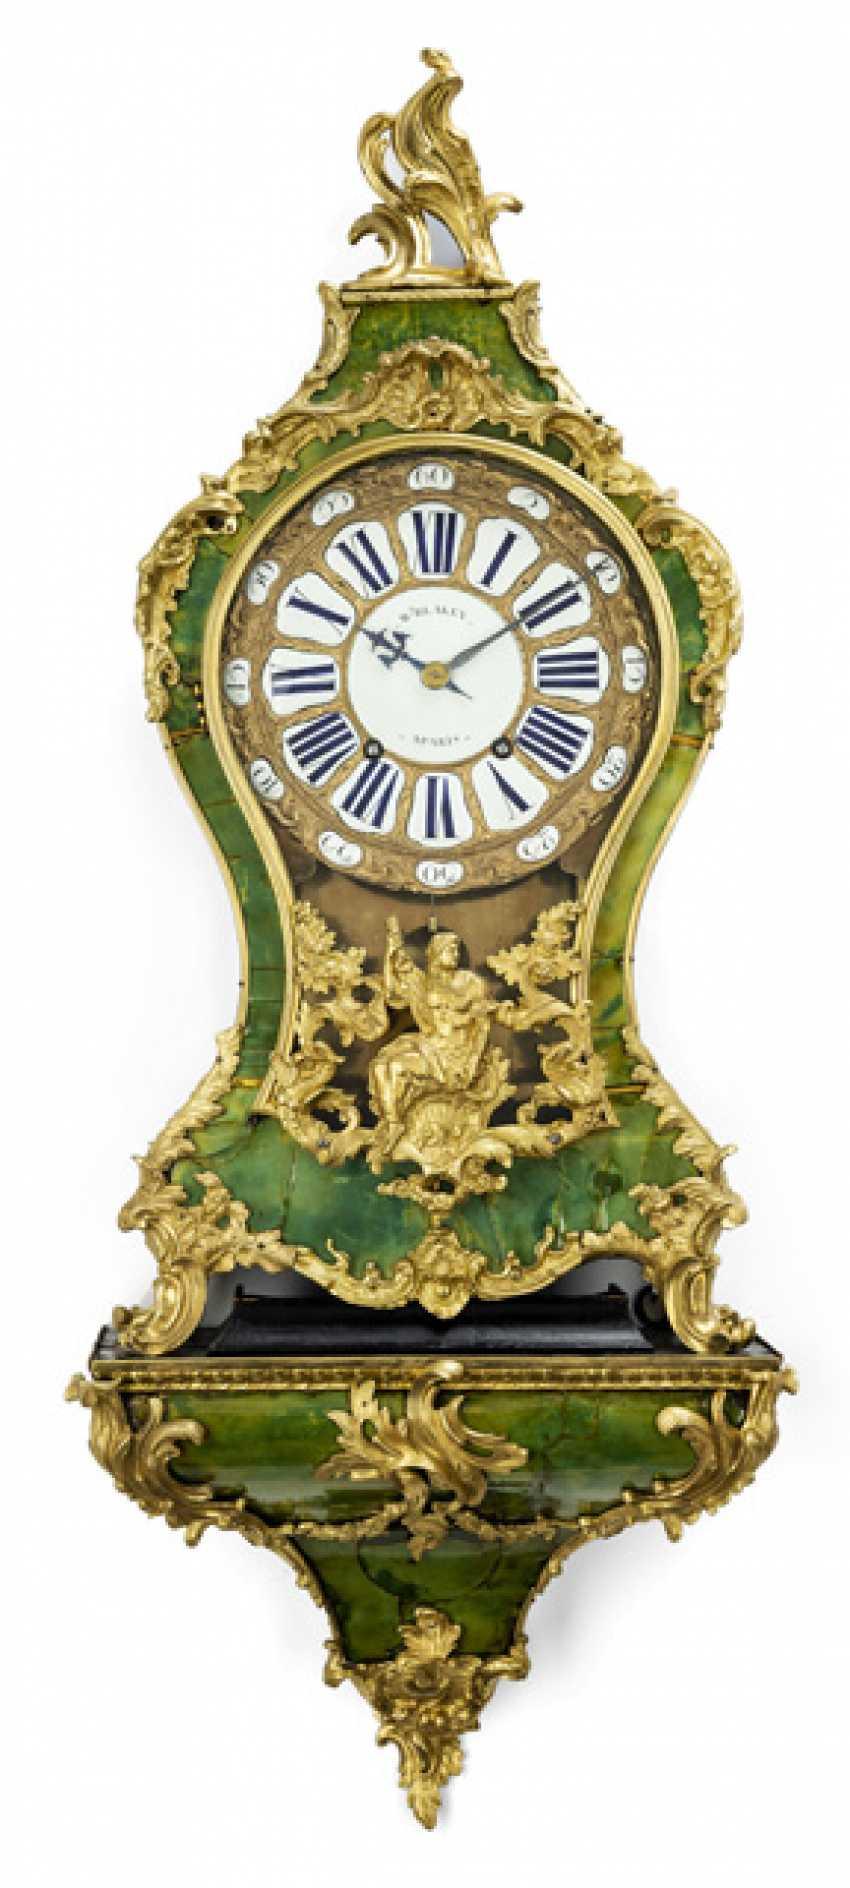 "Pomp pendule ""en corne verte"". Name Blakey A Paris, France, 18. Century - photo 1"